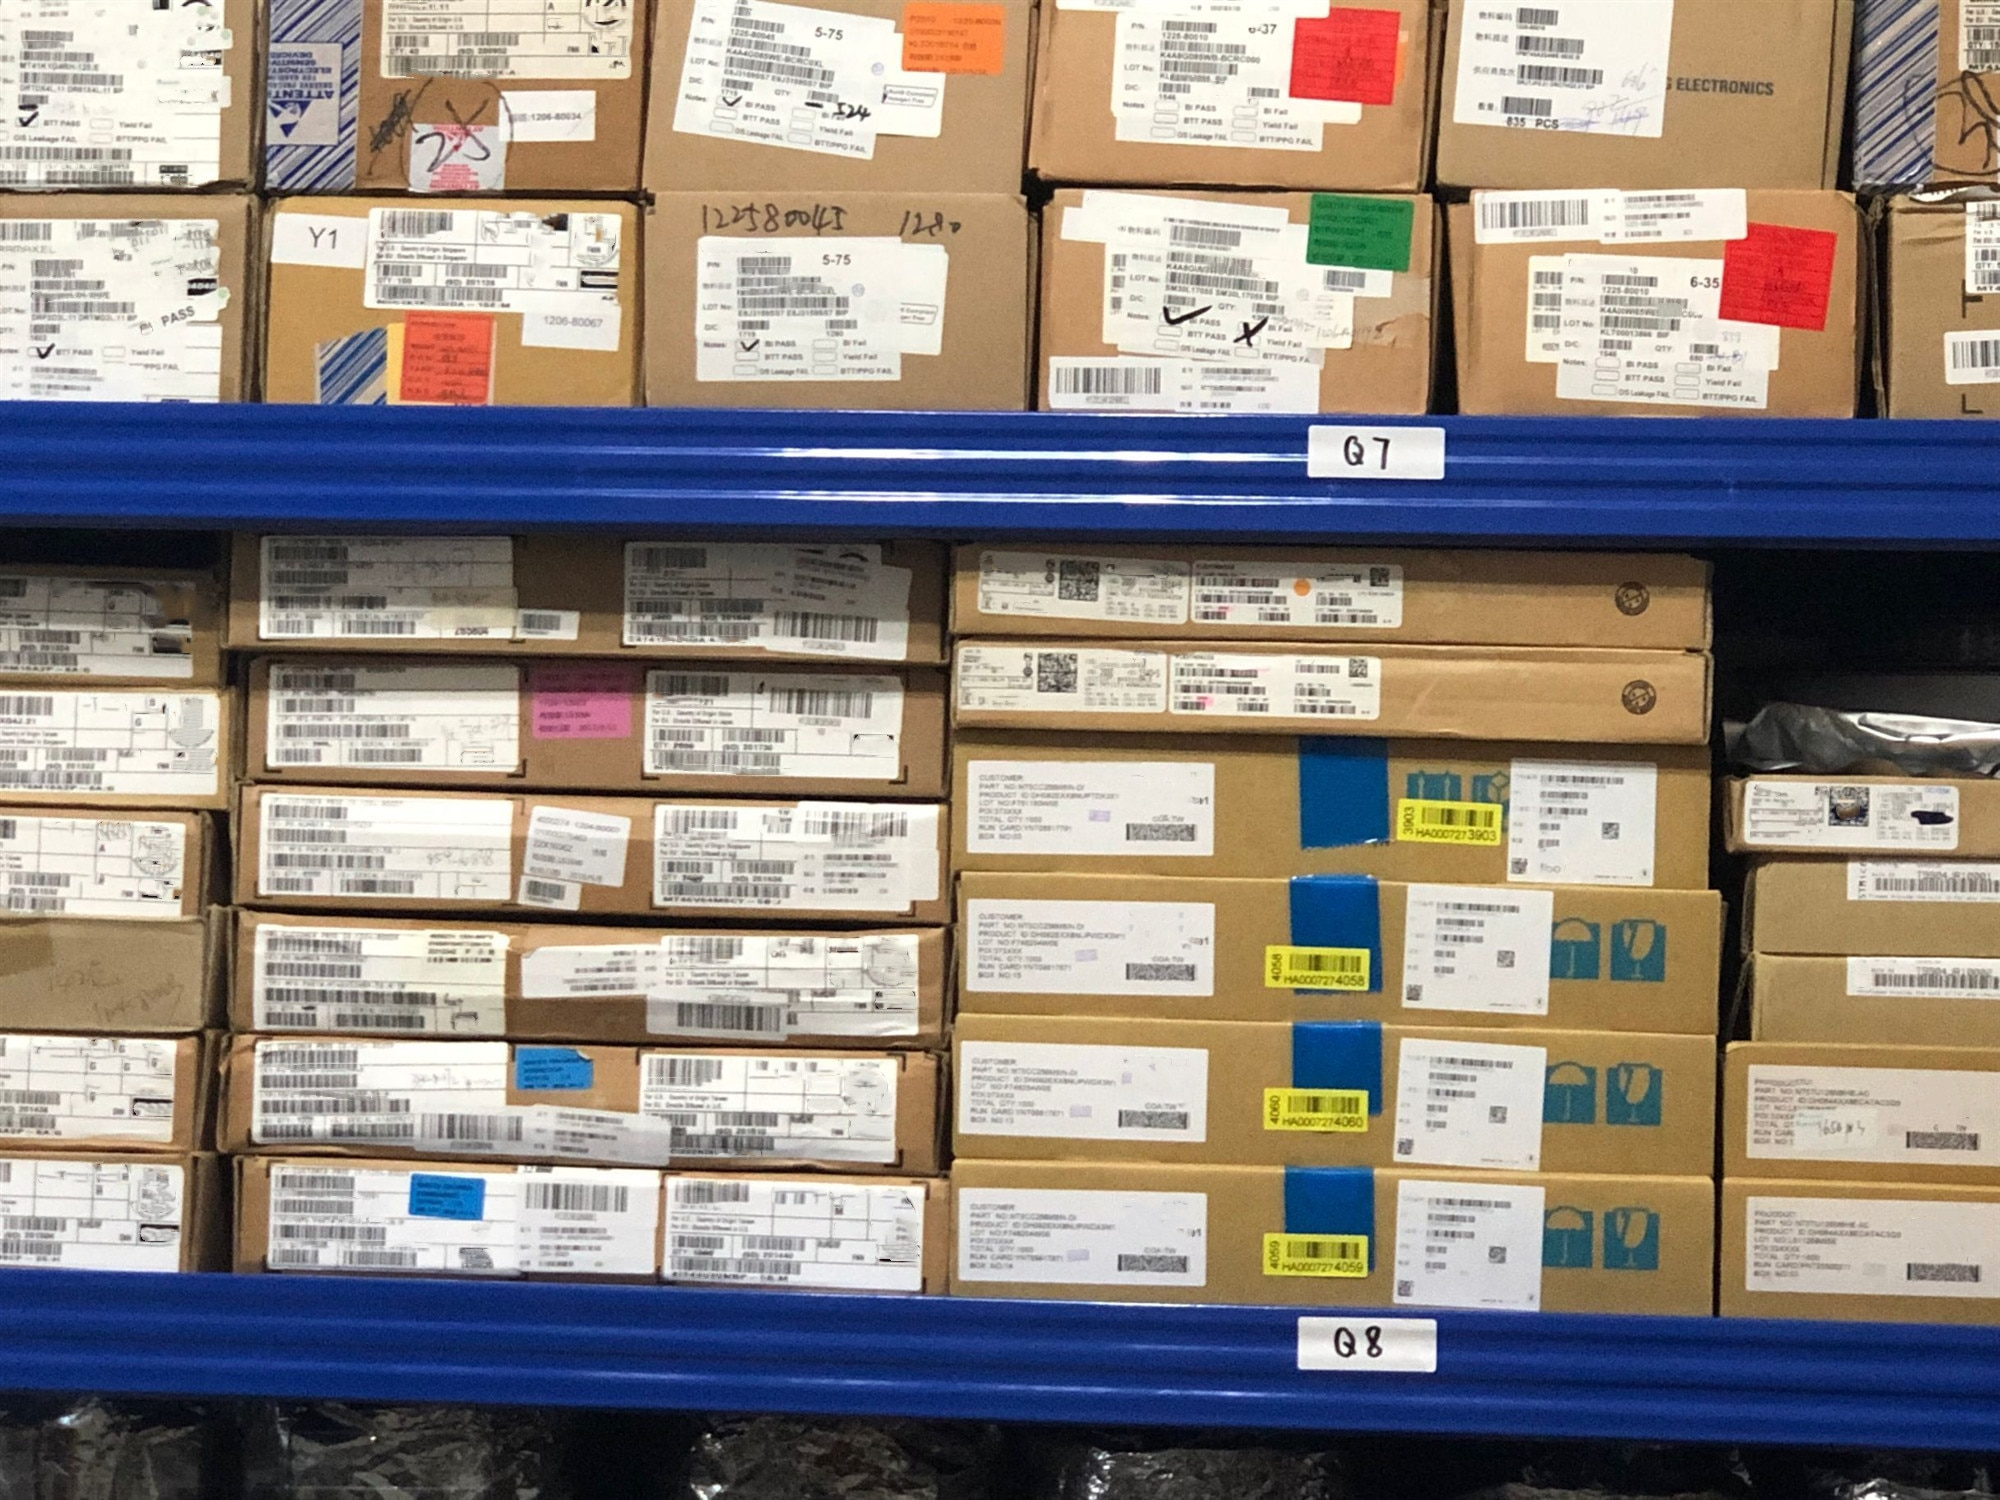 Corriendo venta directa y de alta calidad LSHW-43 HHB-AE1 LSHW-43HHB-AE1 QFN20